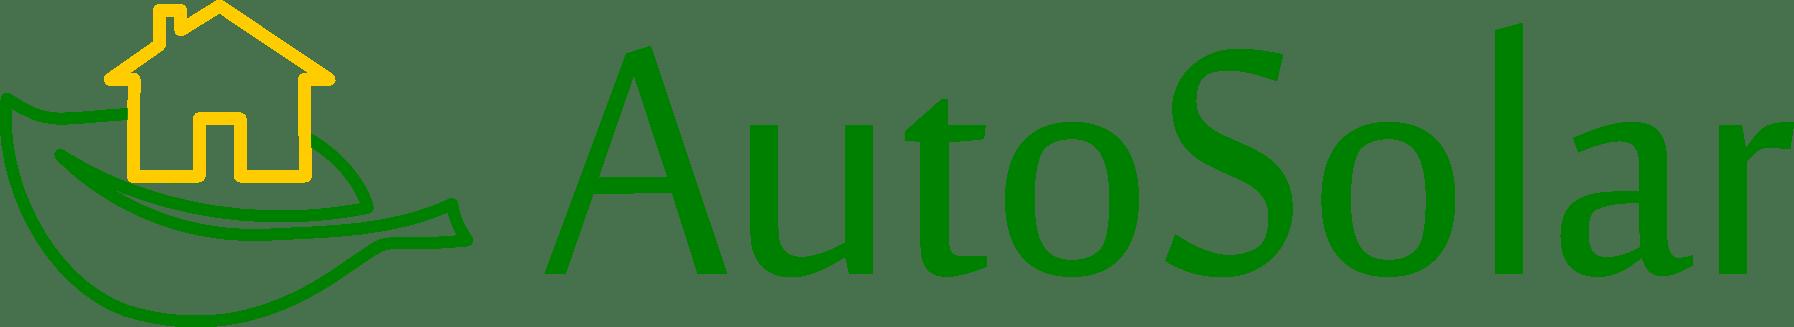 AutoSolar